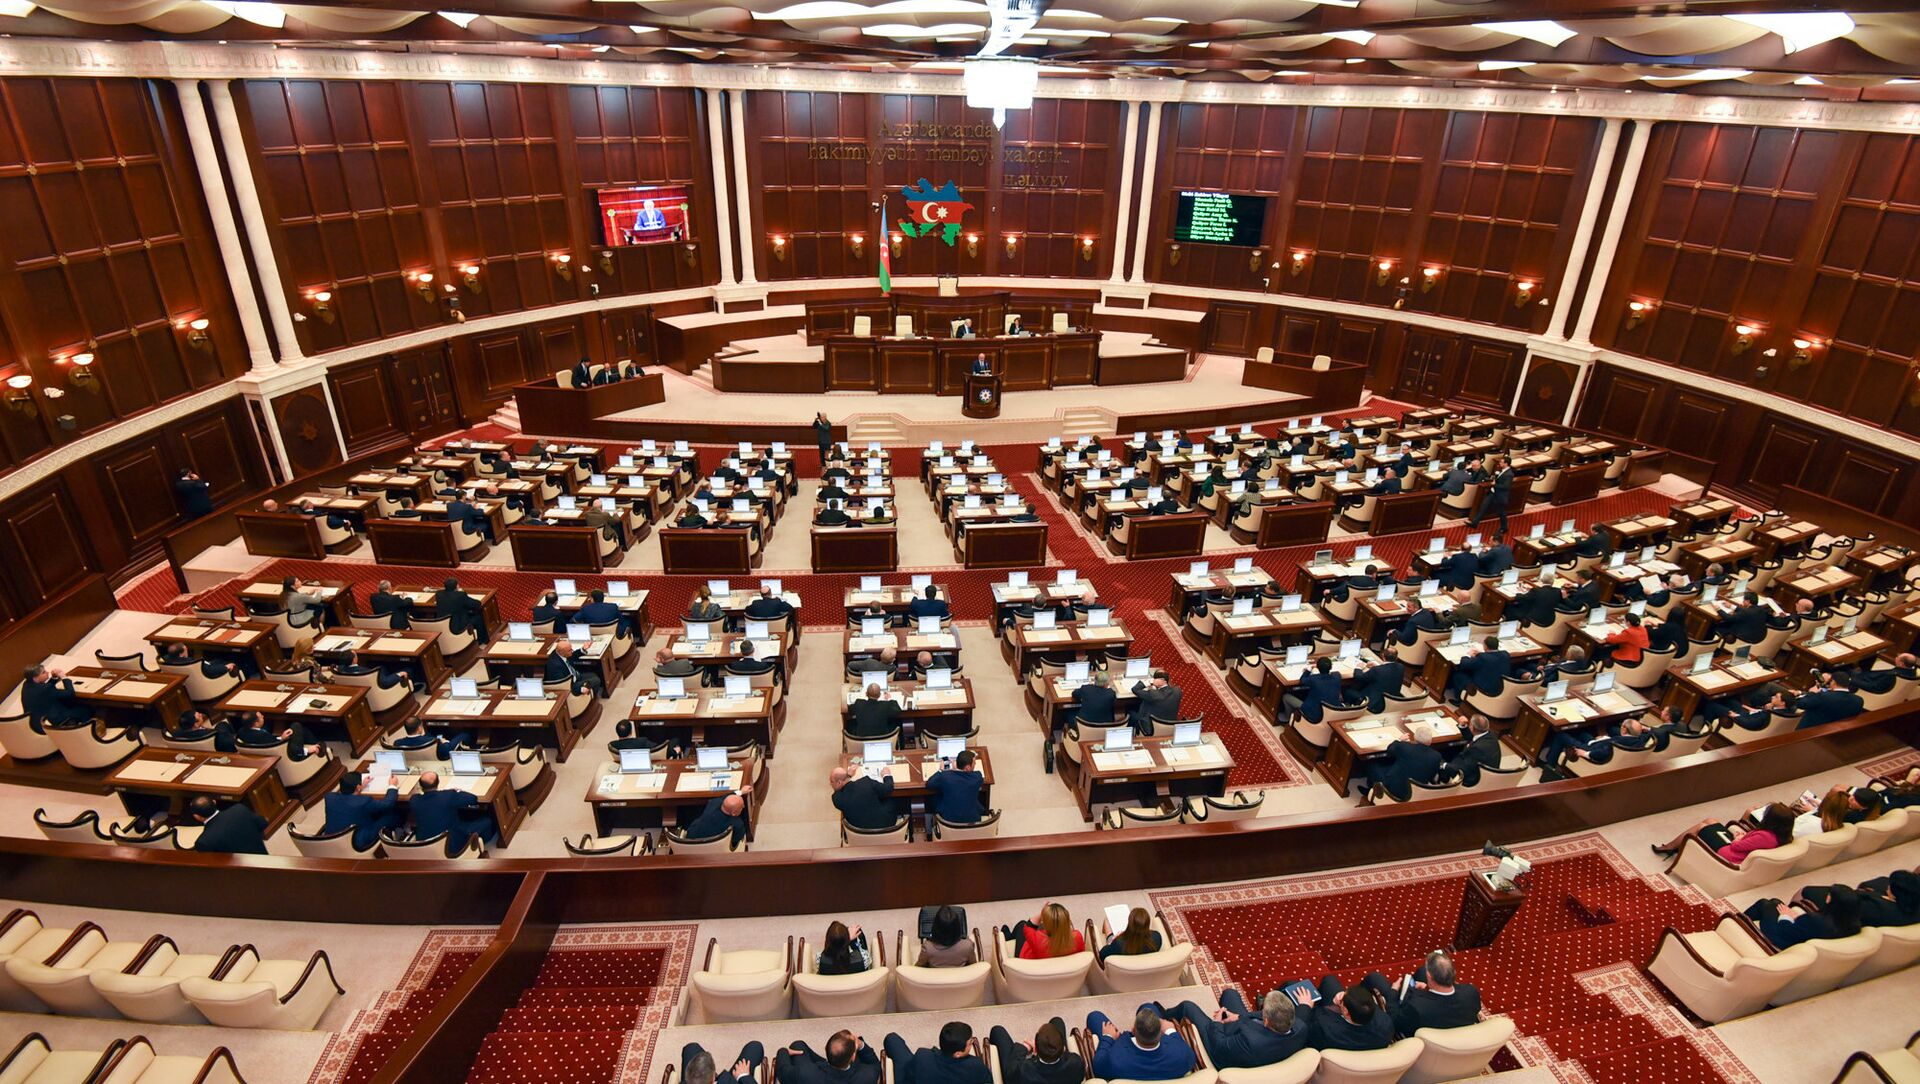 Заседание парламента Азербайджана, фото из архива - Sputnik Azərbaycan, 1920, 02.07.2021